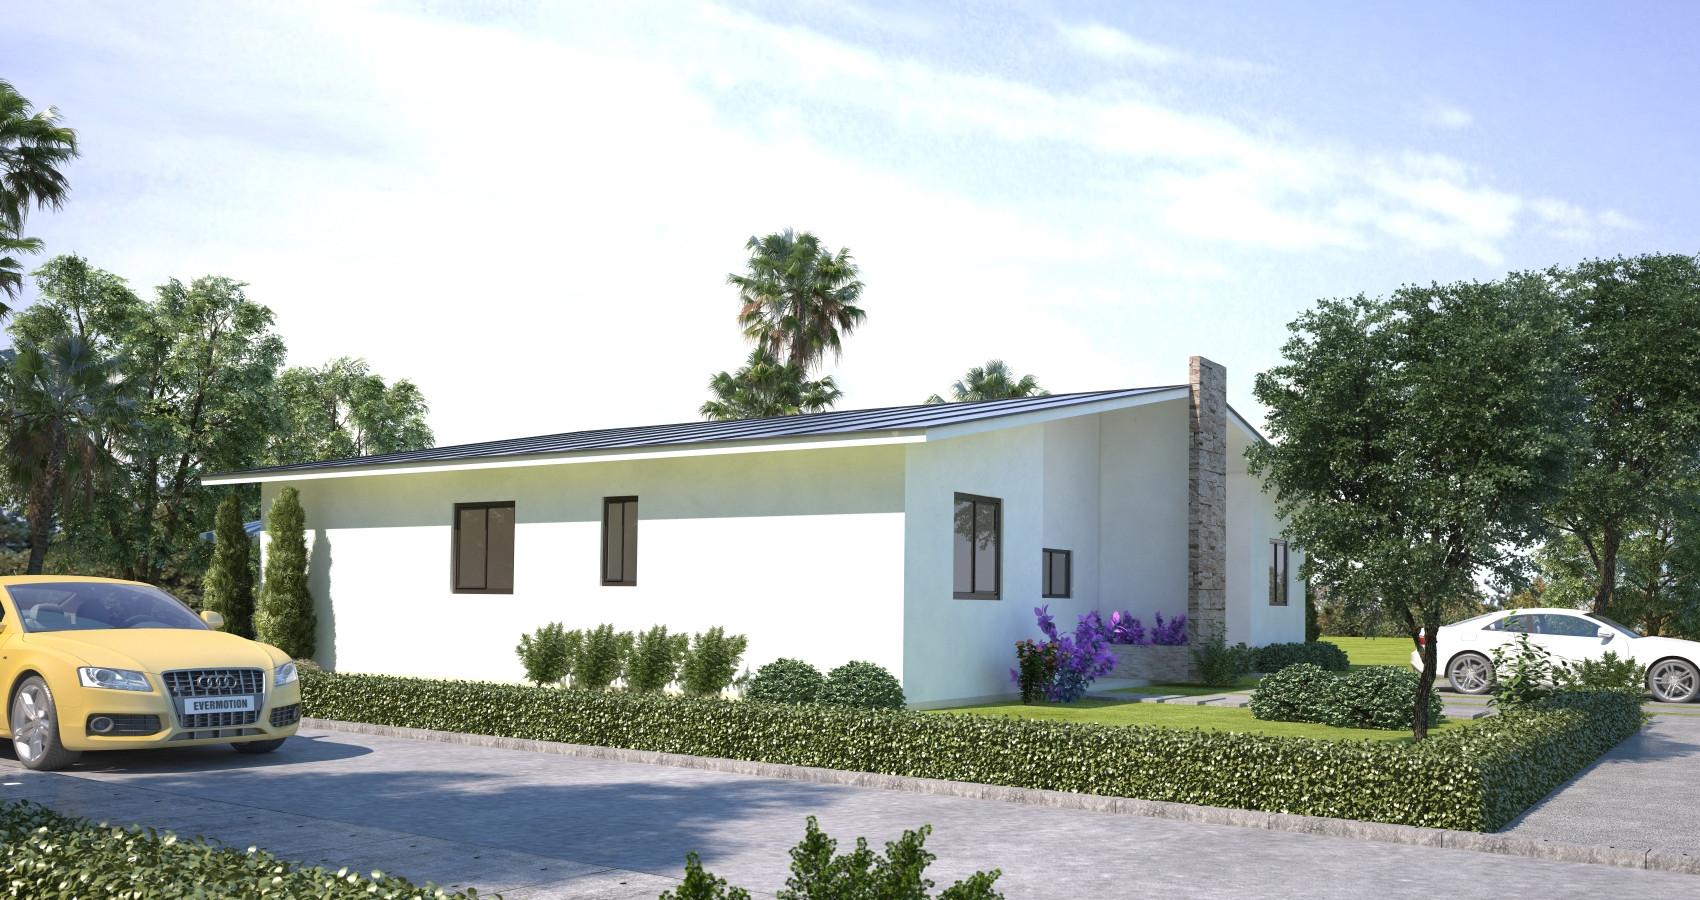 house3 re.jpg